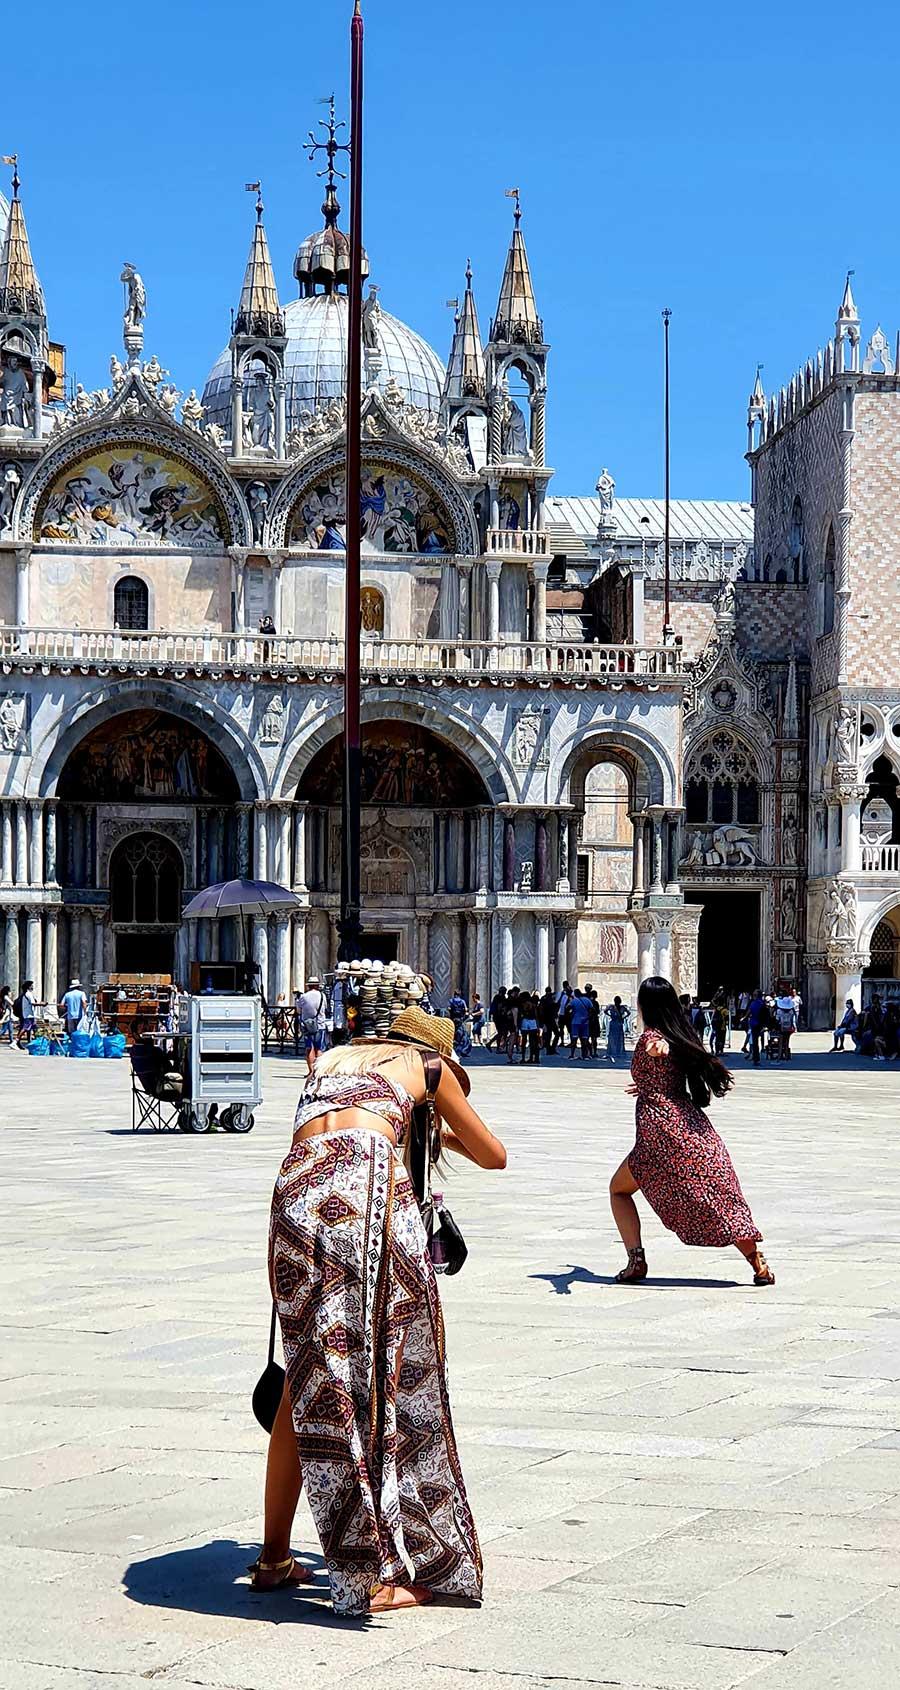 brown dress Venice